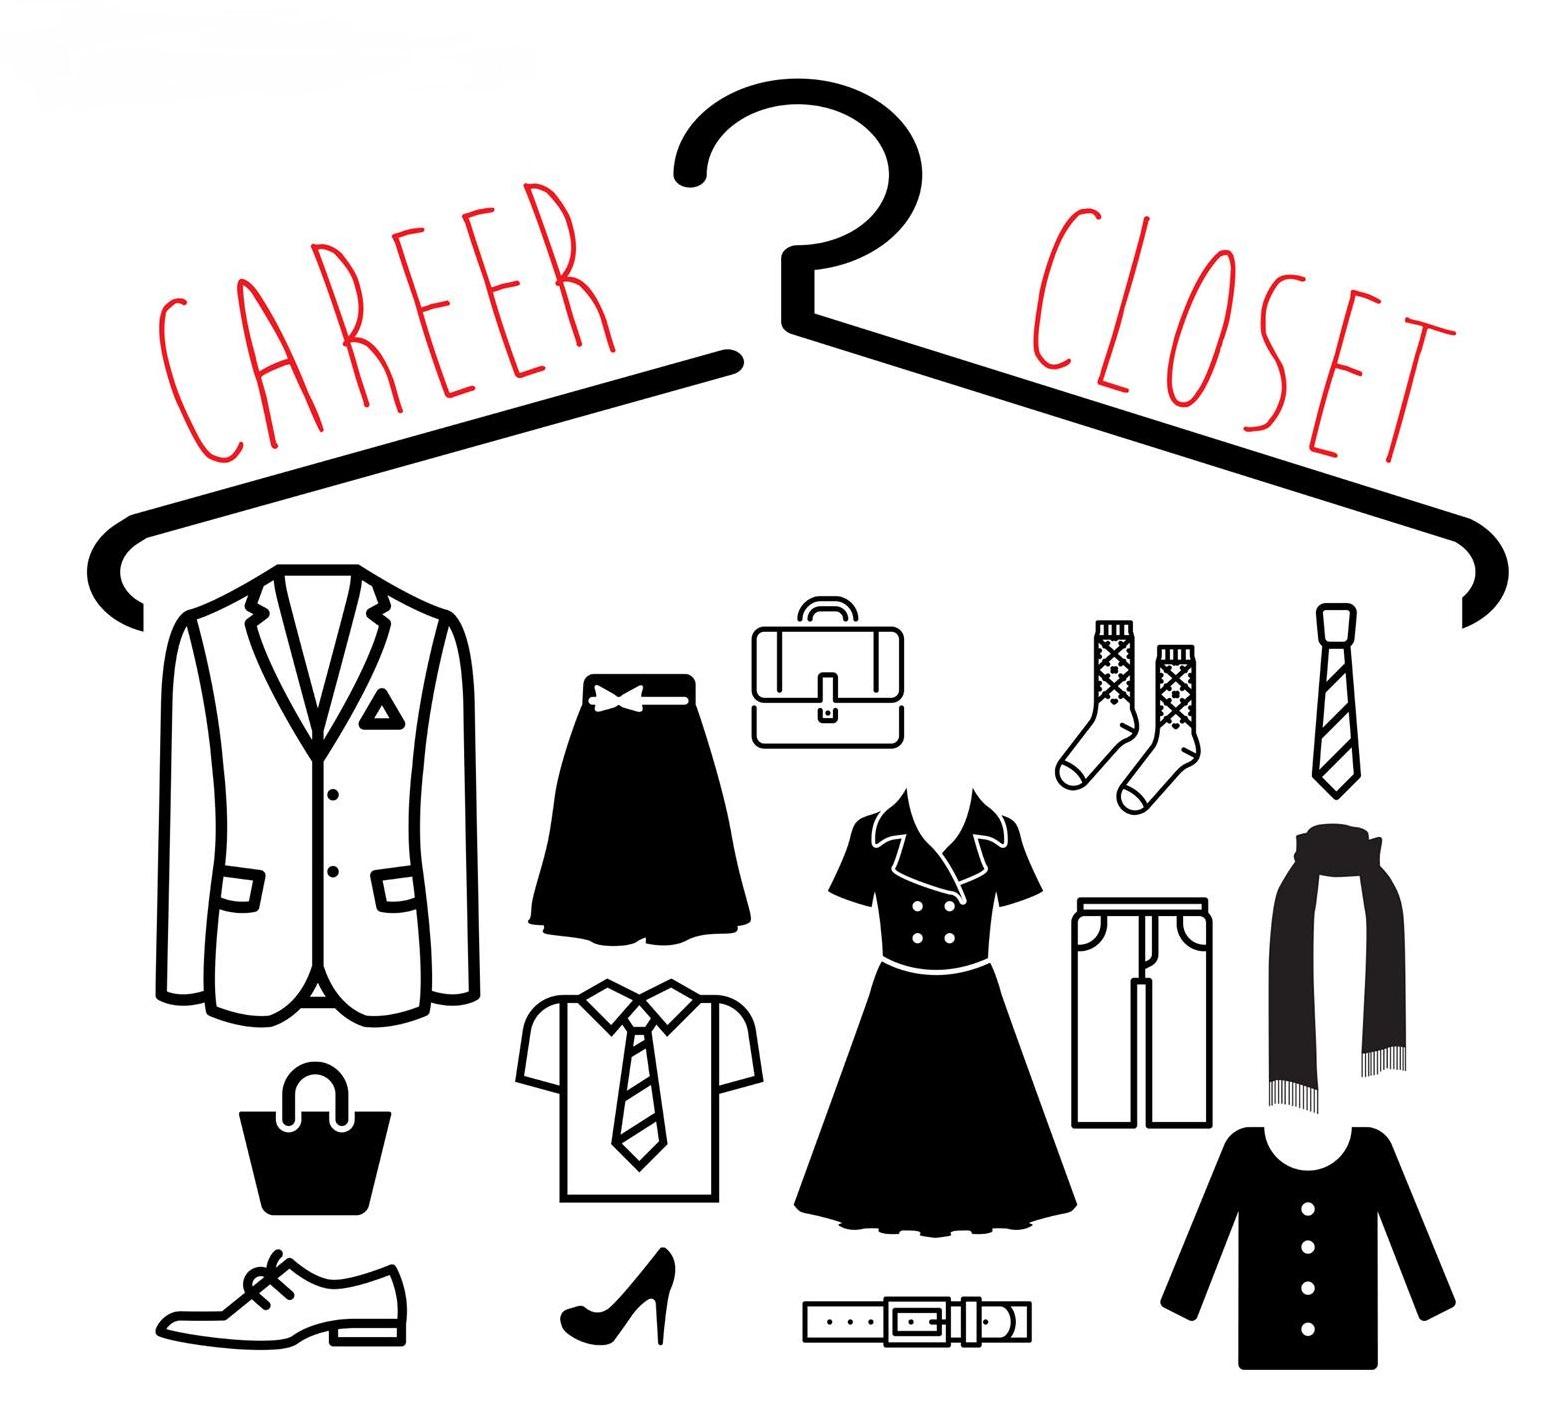 CareerCloset1.jpg